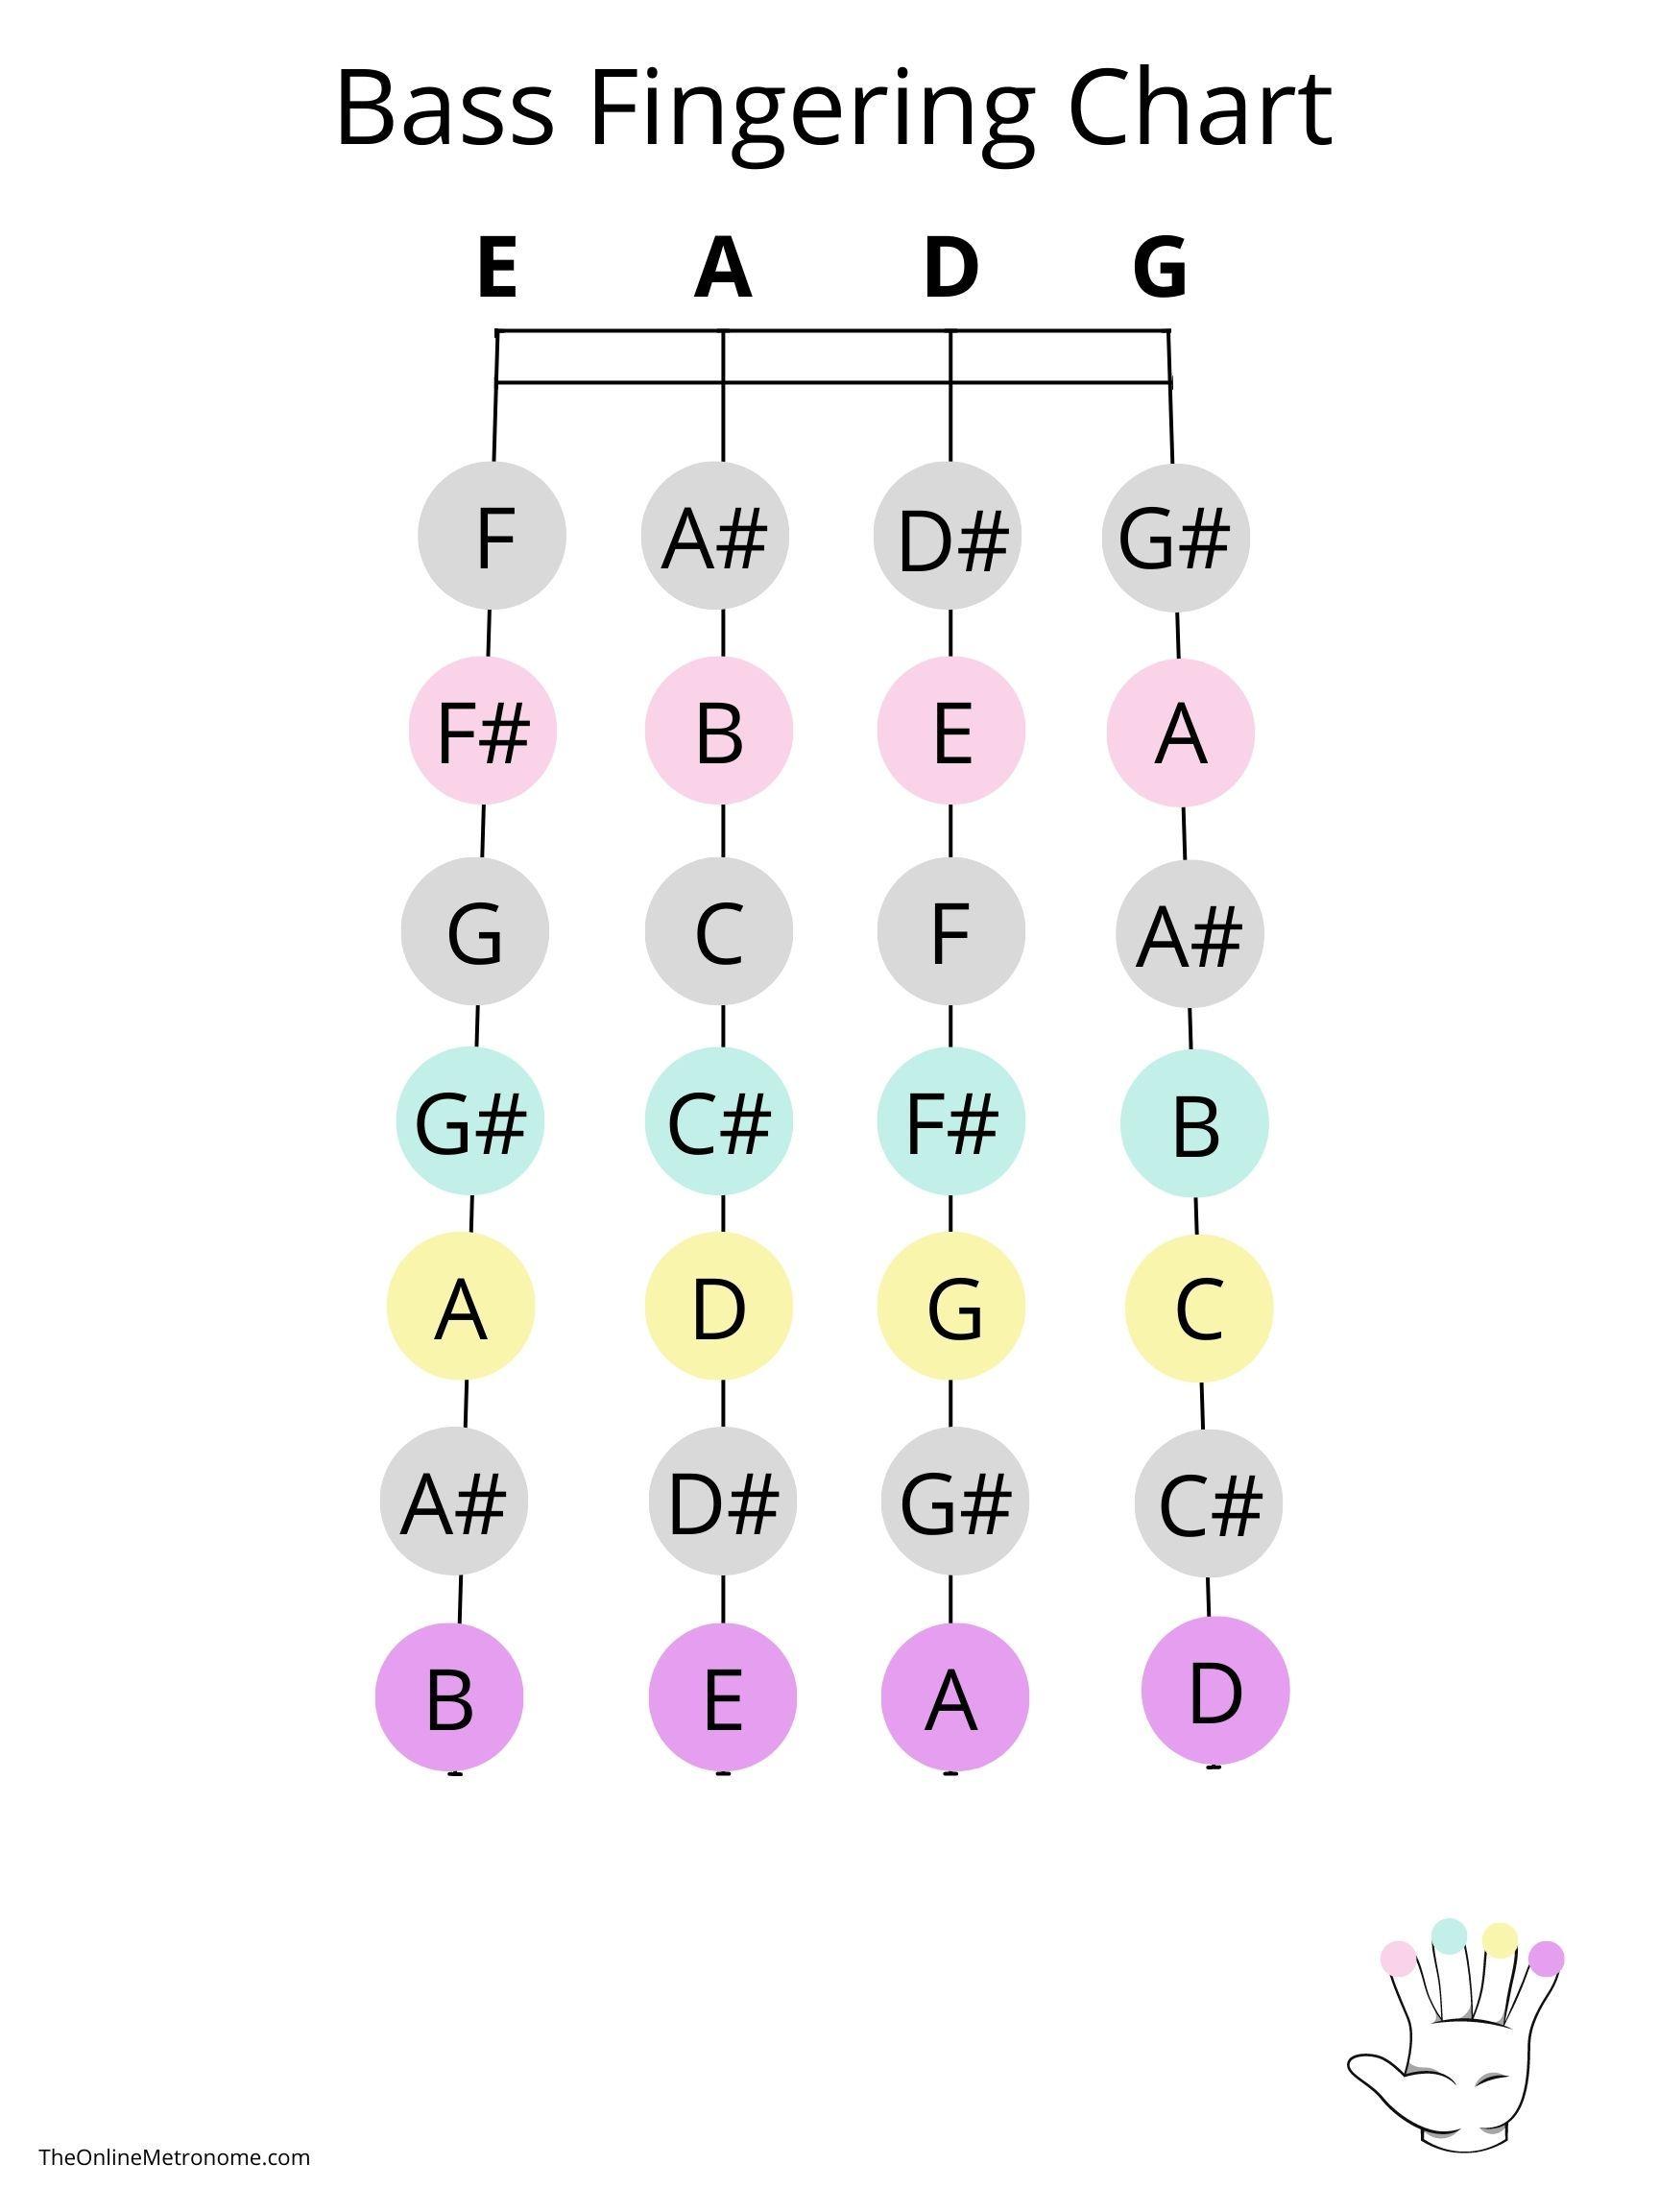 double-bass-fingering-chart.jpg